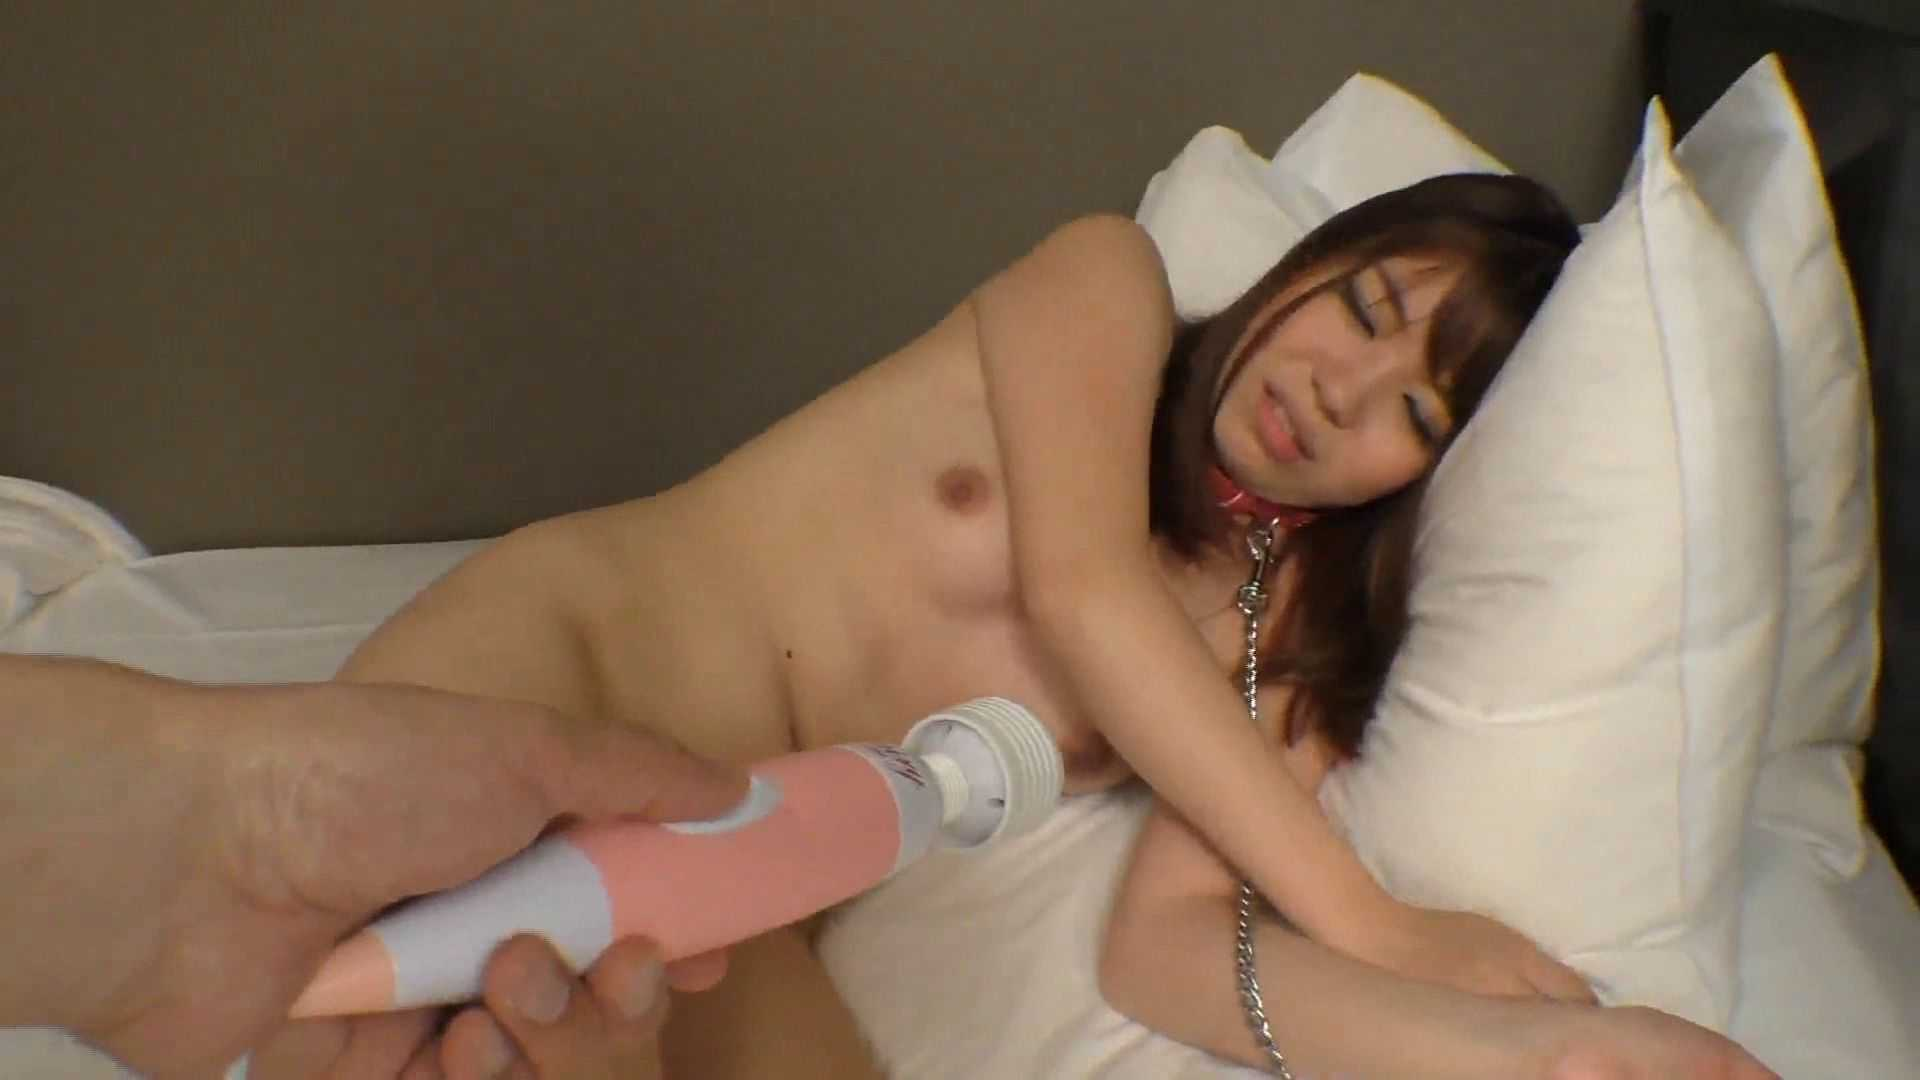 S級厳選美女ビッチガールVol.09 美女ヌード | OLセックス  102画像 100